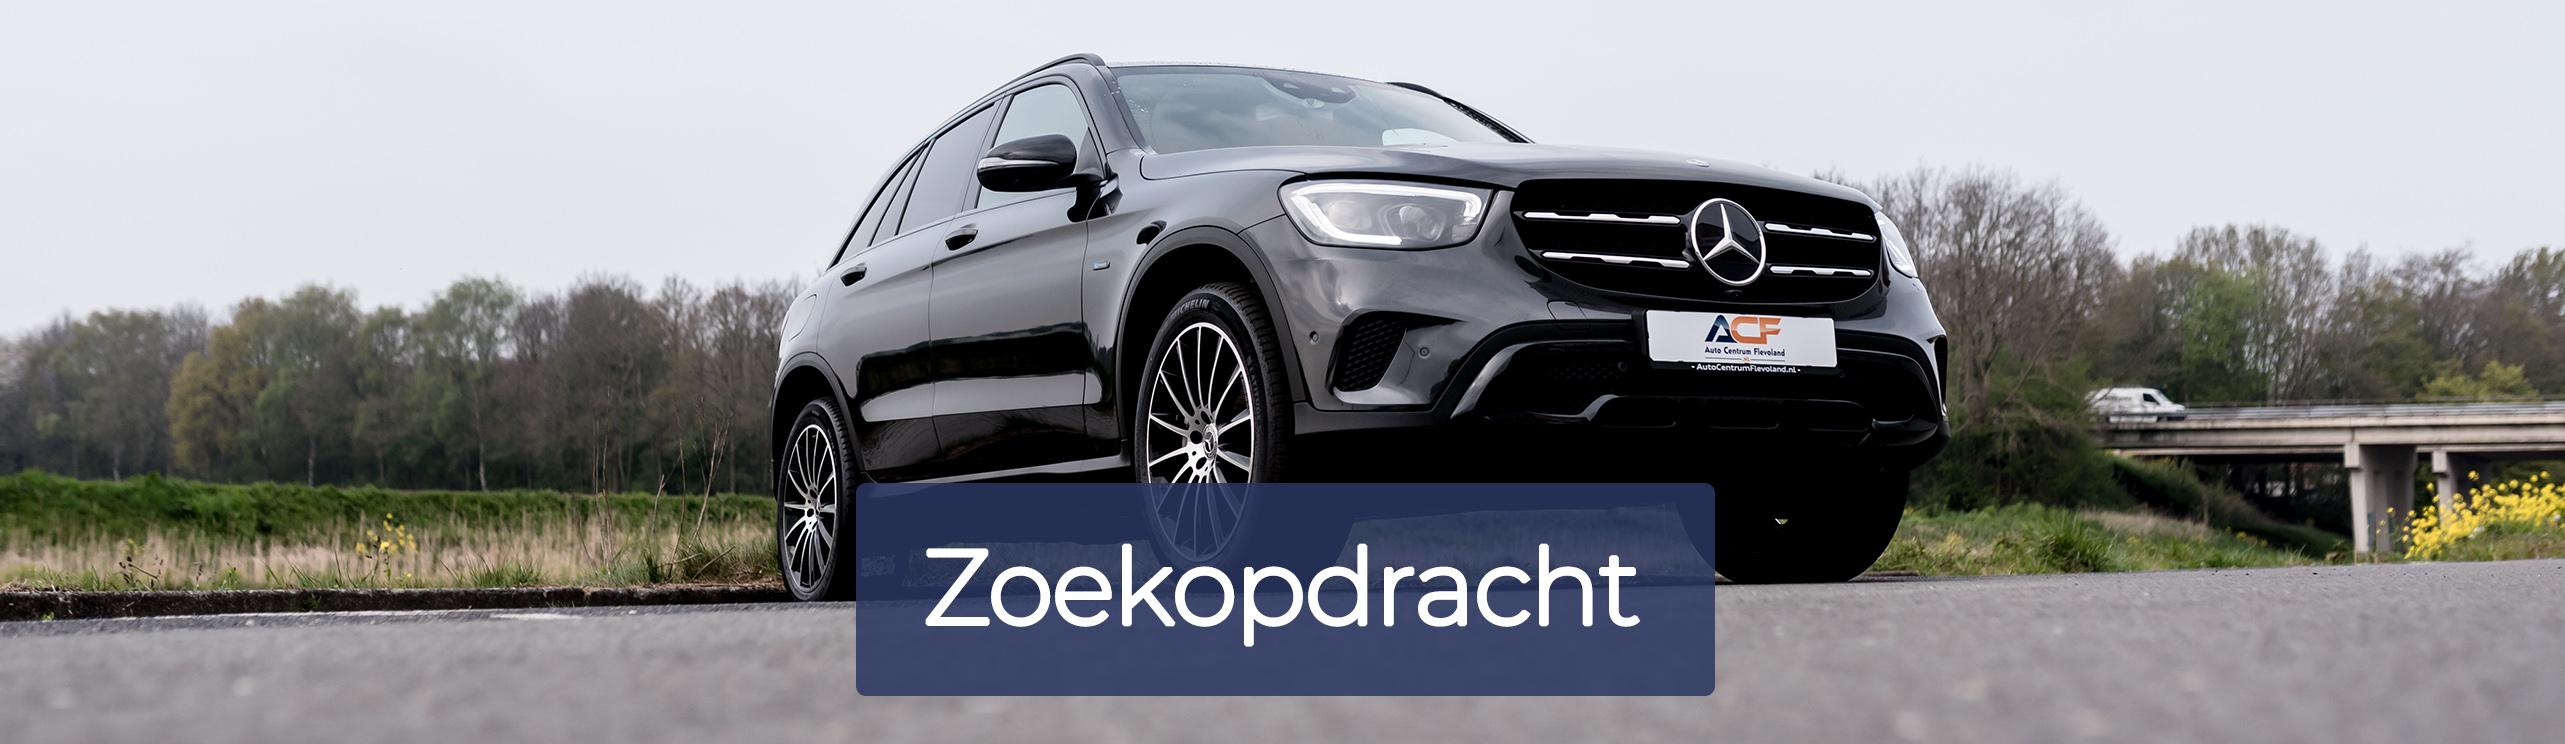 Zoekopdracht Autocentrum Flevoland in Emmeloord